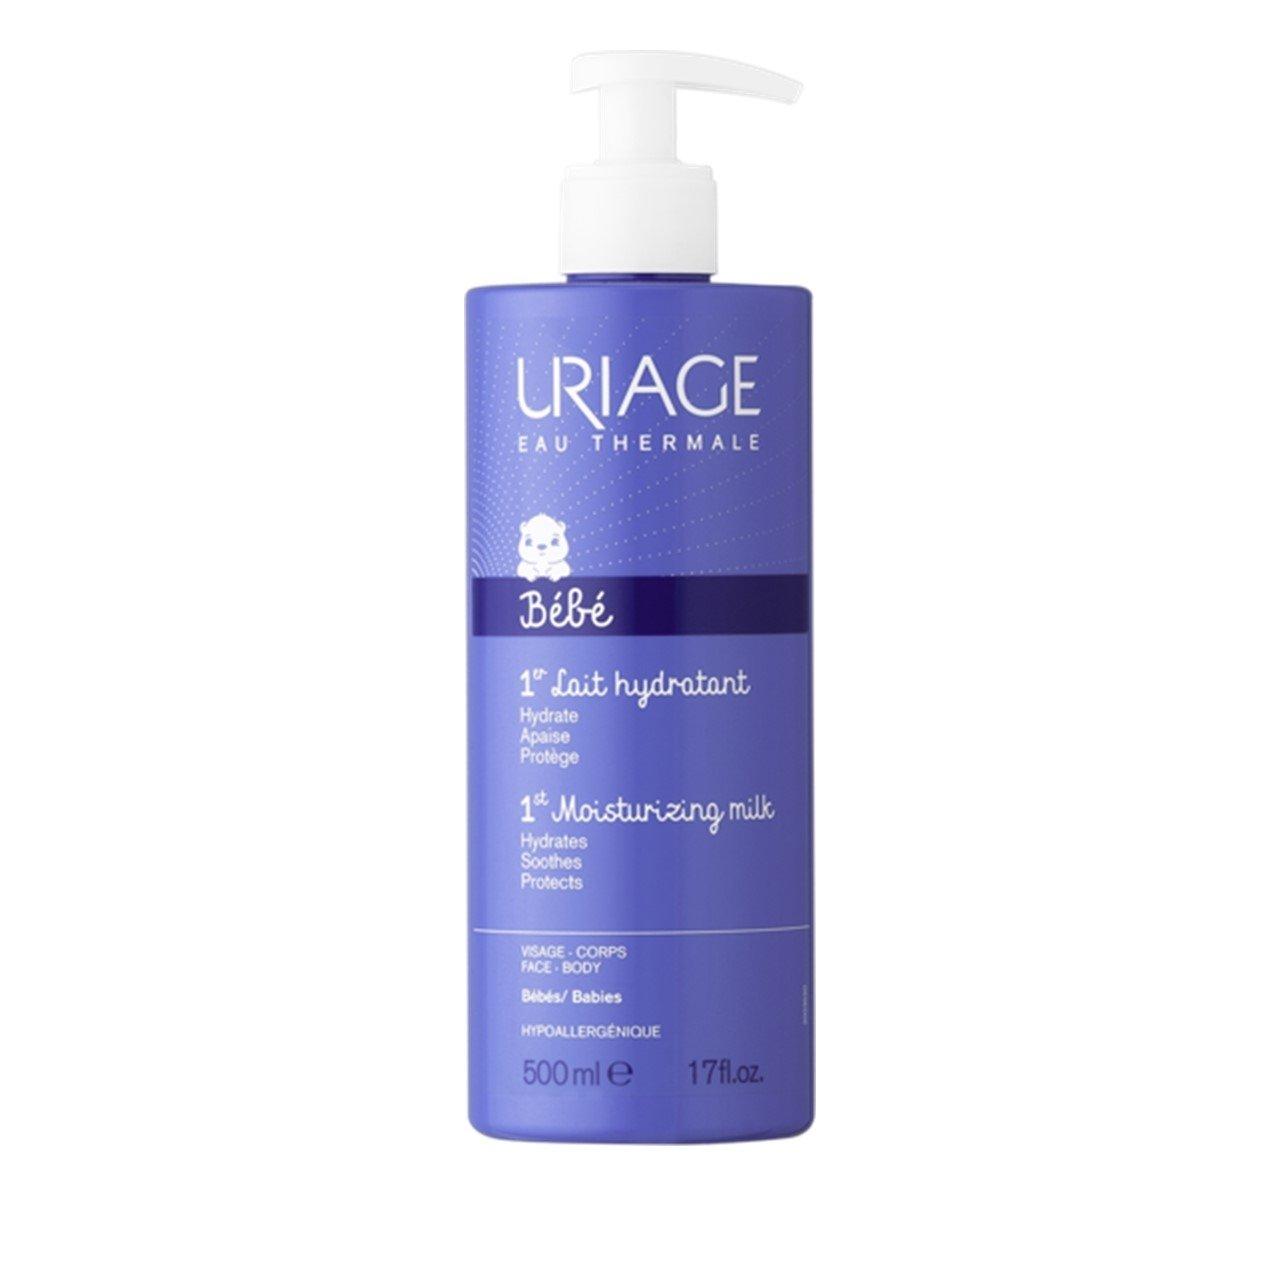 Senka White Beauty Lotion Ii Review: Buy Uriage Baby 1st Moisturizing Milk 500ml · Saudi Arabia